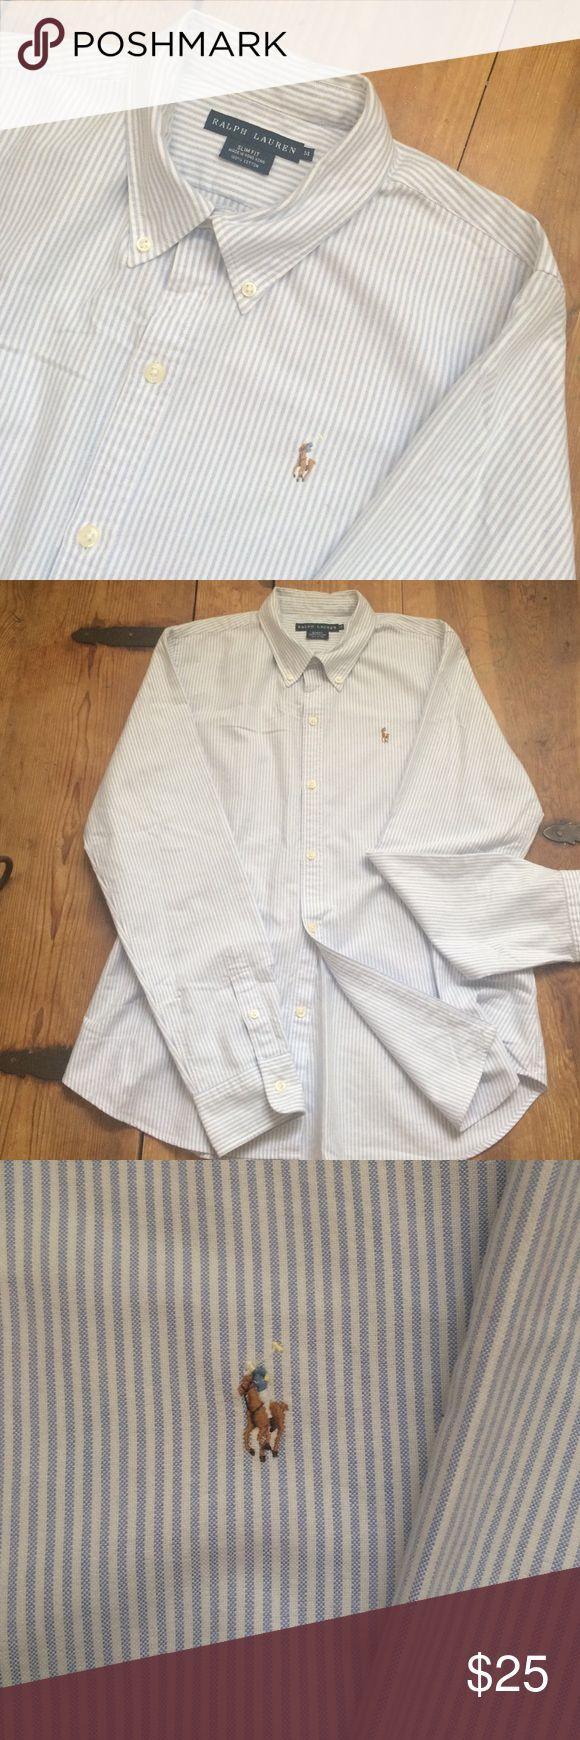 "•Ralph•Lauren•Women's•Oxford•Shirt• Slim fit• size (14) large•blue/white stripes• multi-color pony• bust:22"" length:27""• GUC• no flaws• Ralph Lauren Tops Button Down Shirts"